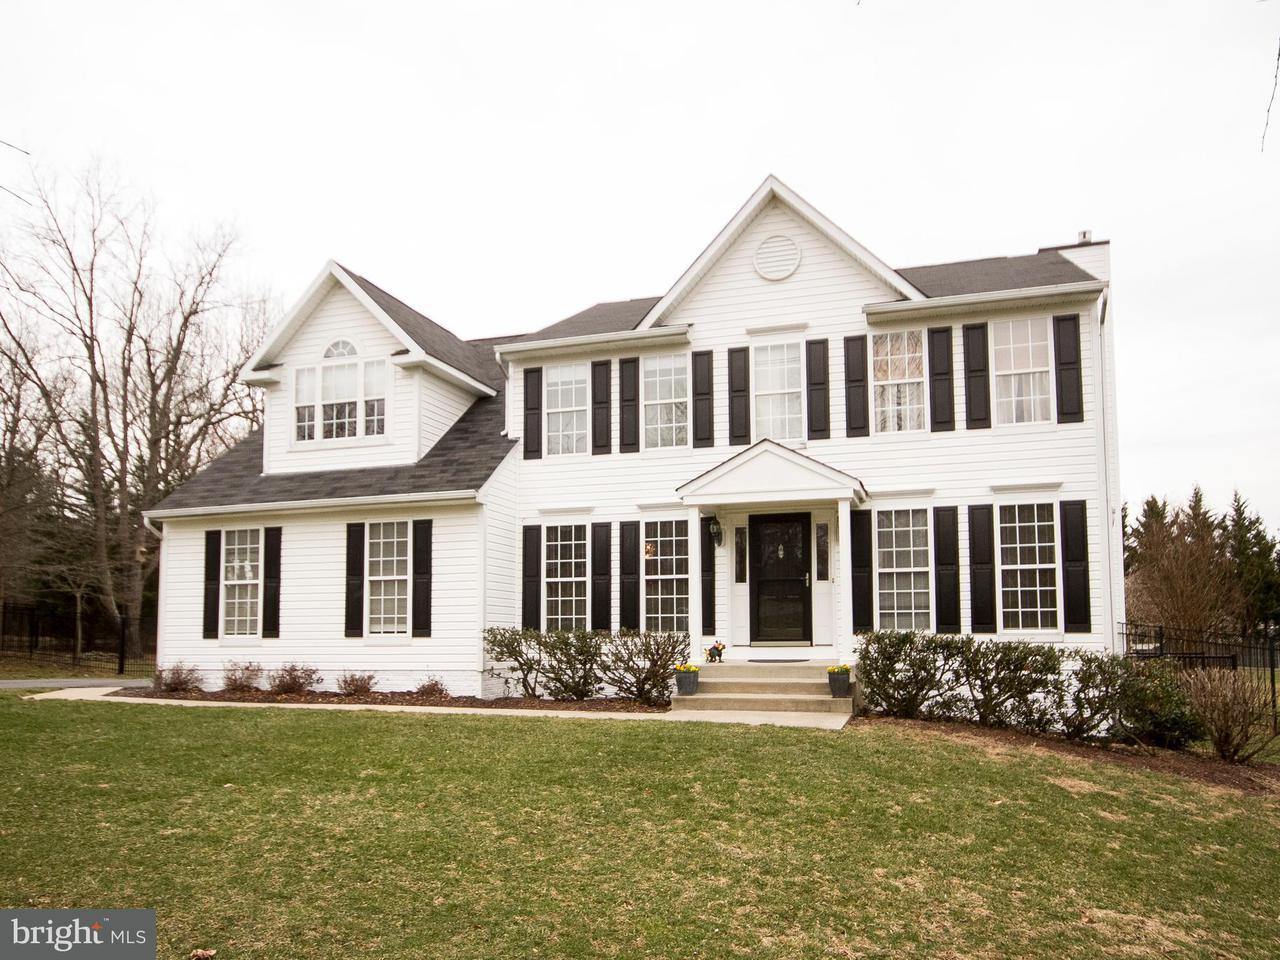 独户住宅 为 销售 在 10 Caitlins Court 10 Caitlins Court Windsor Mill, 马里兰州 21244 美国